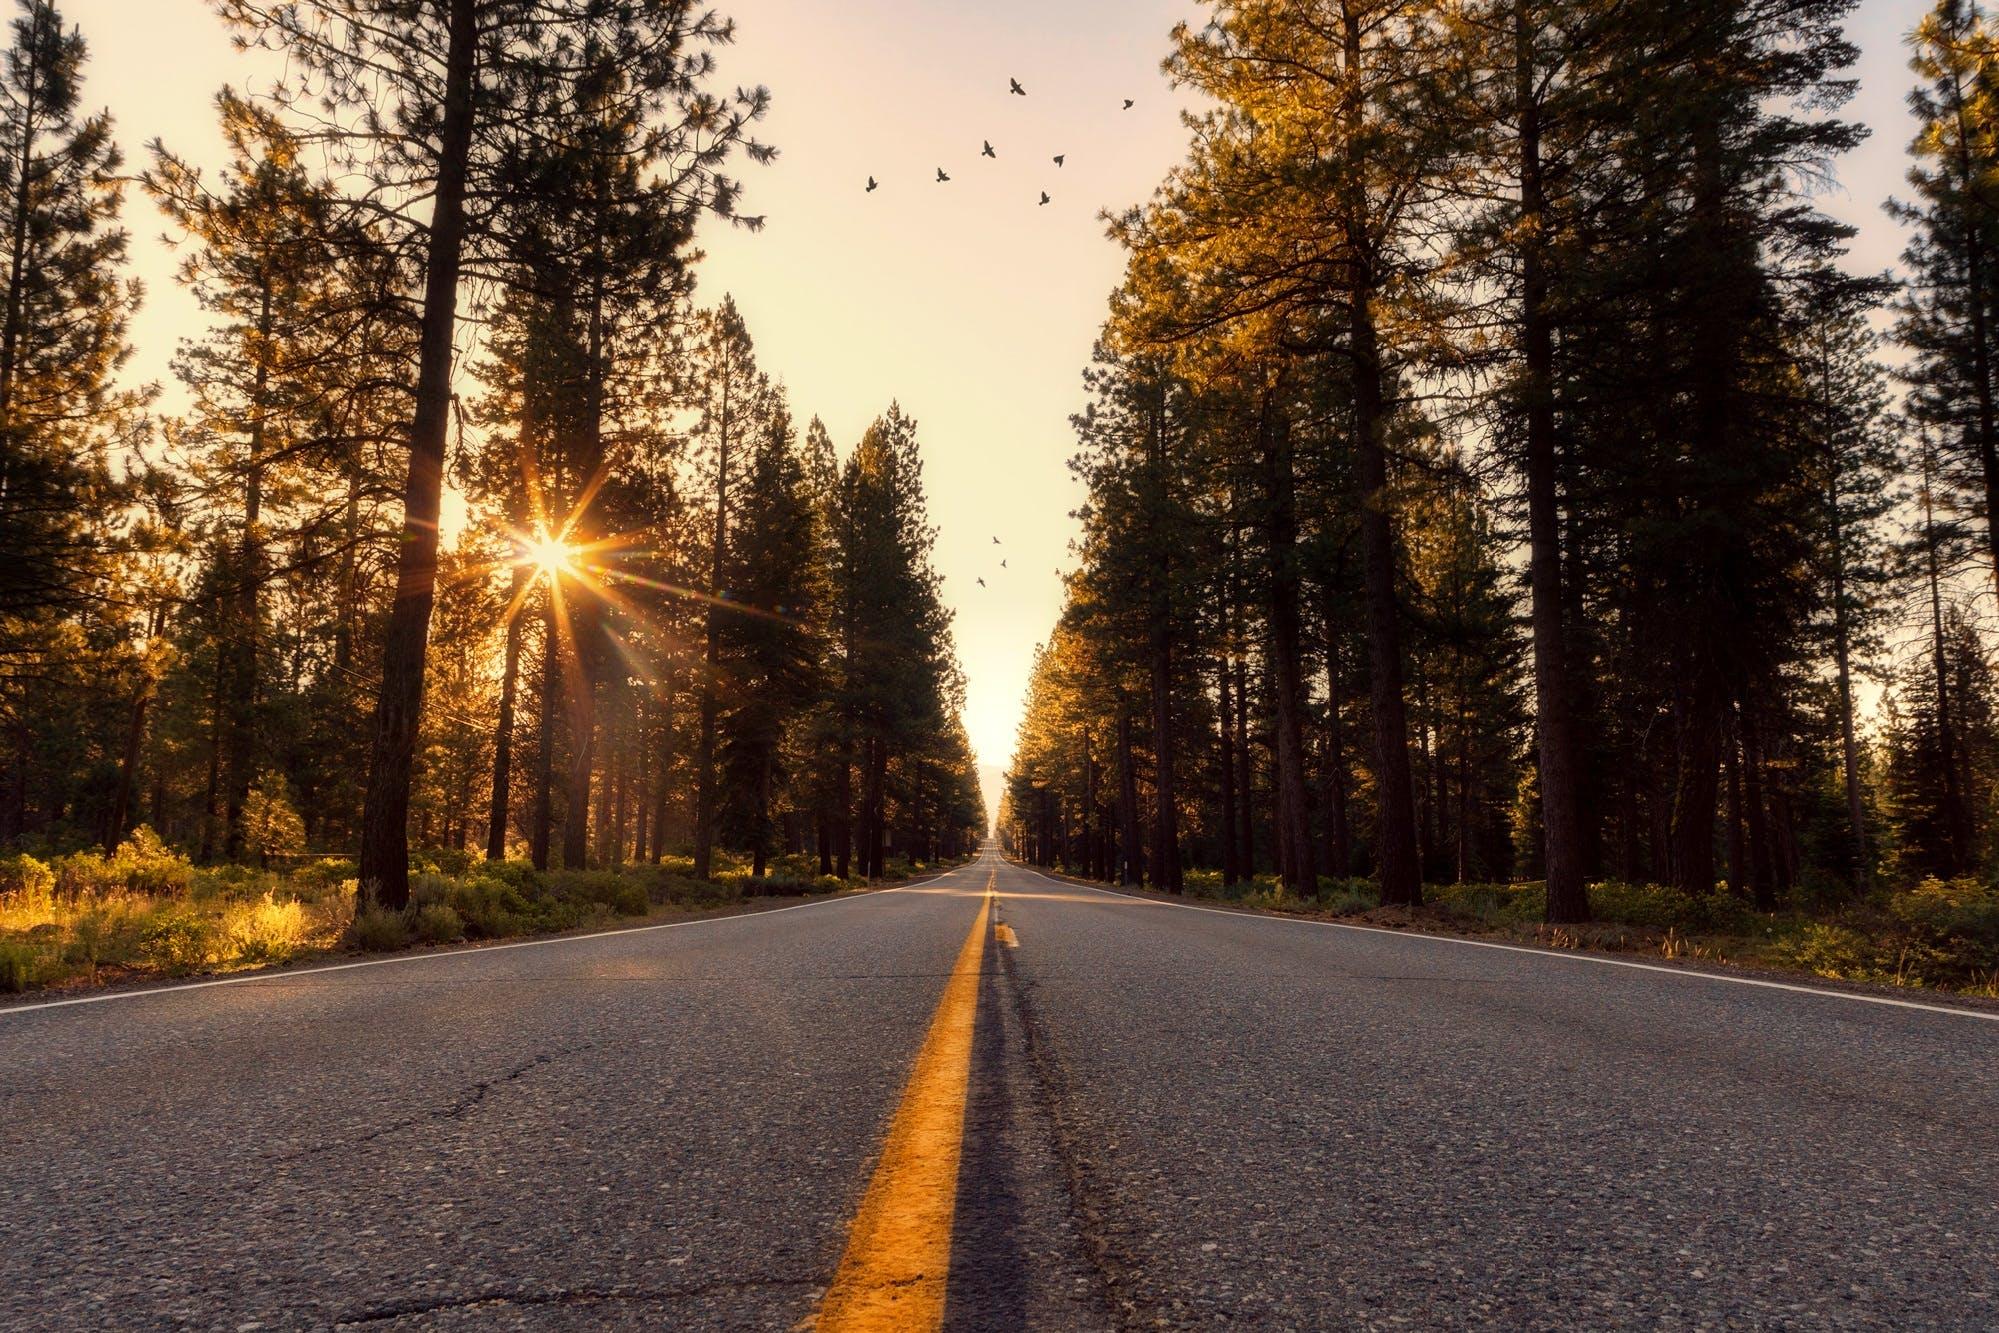 abenteuer, asphalt, autobahn